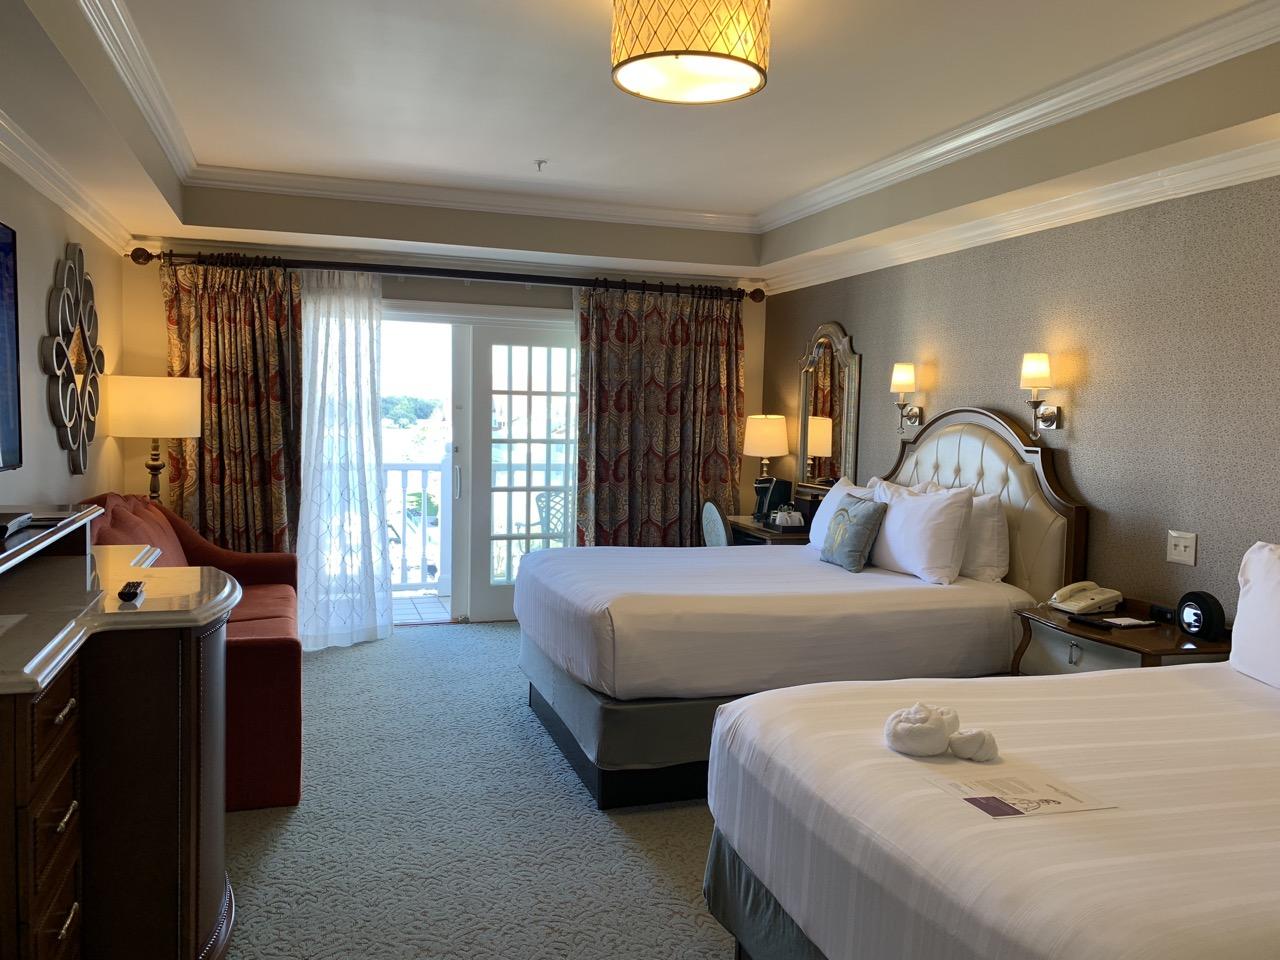 disney world best deluxe resort hotel ranking 15 grand floridian room.jpeg